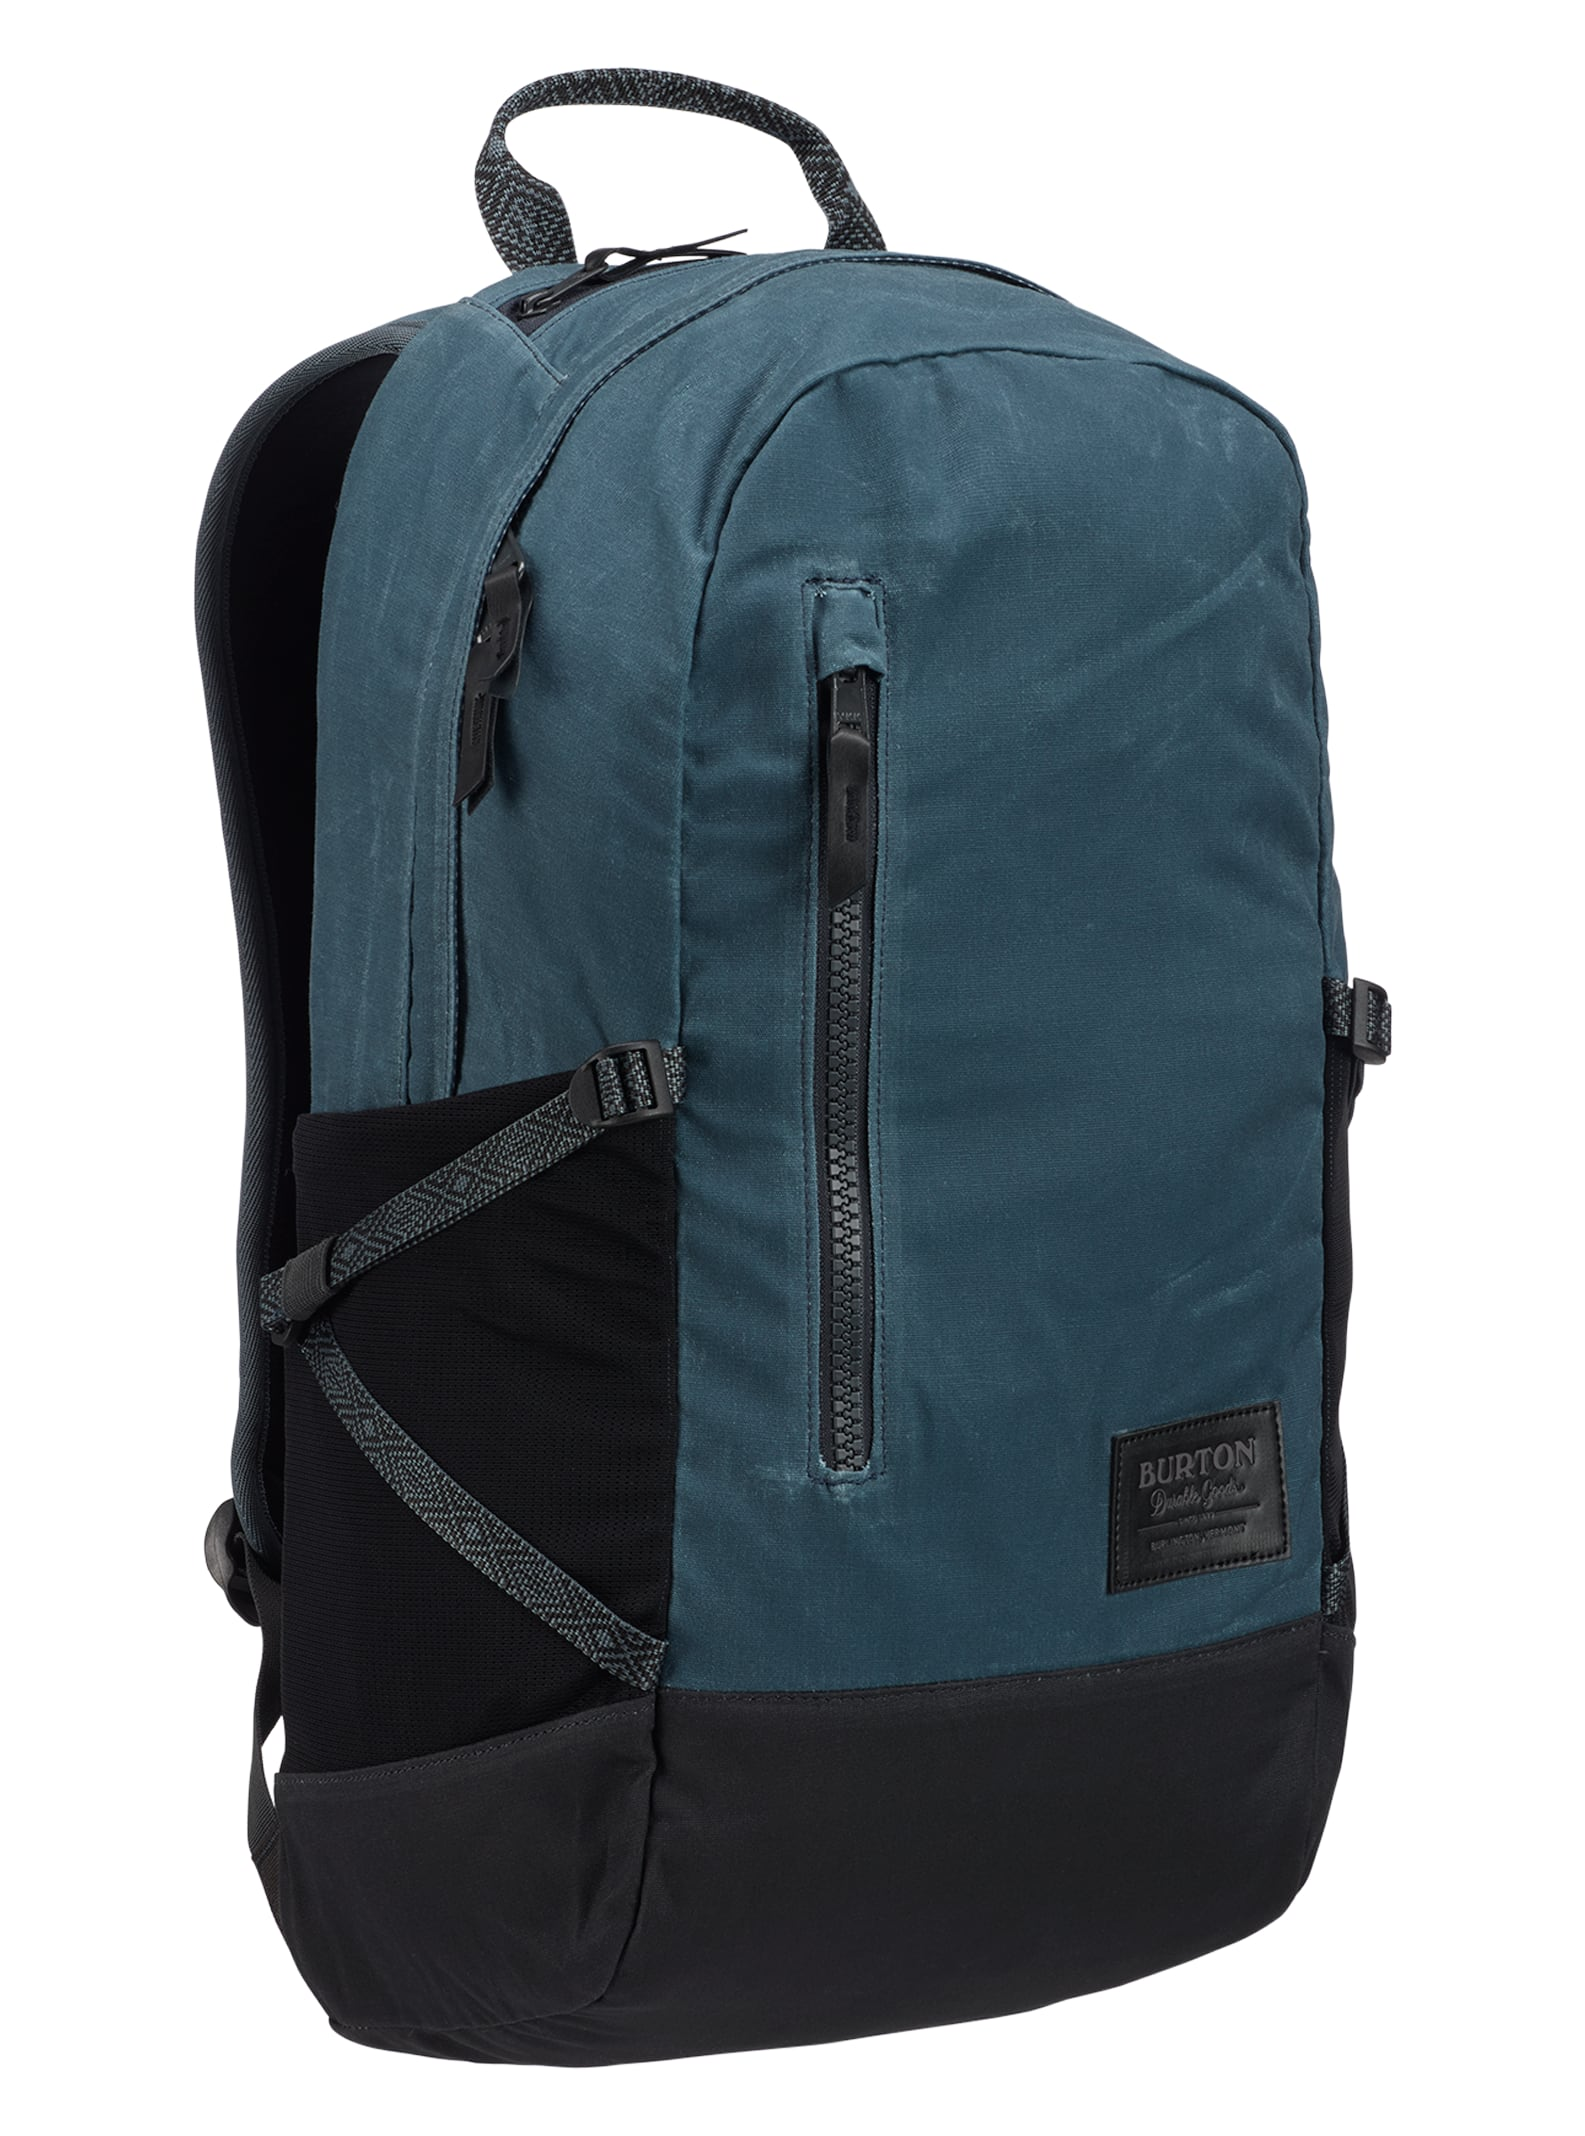 6e4b80ff0b1 Backpacks | Burton Snowboards